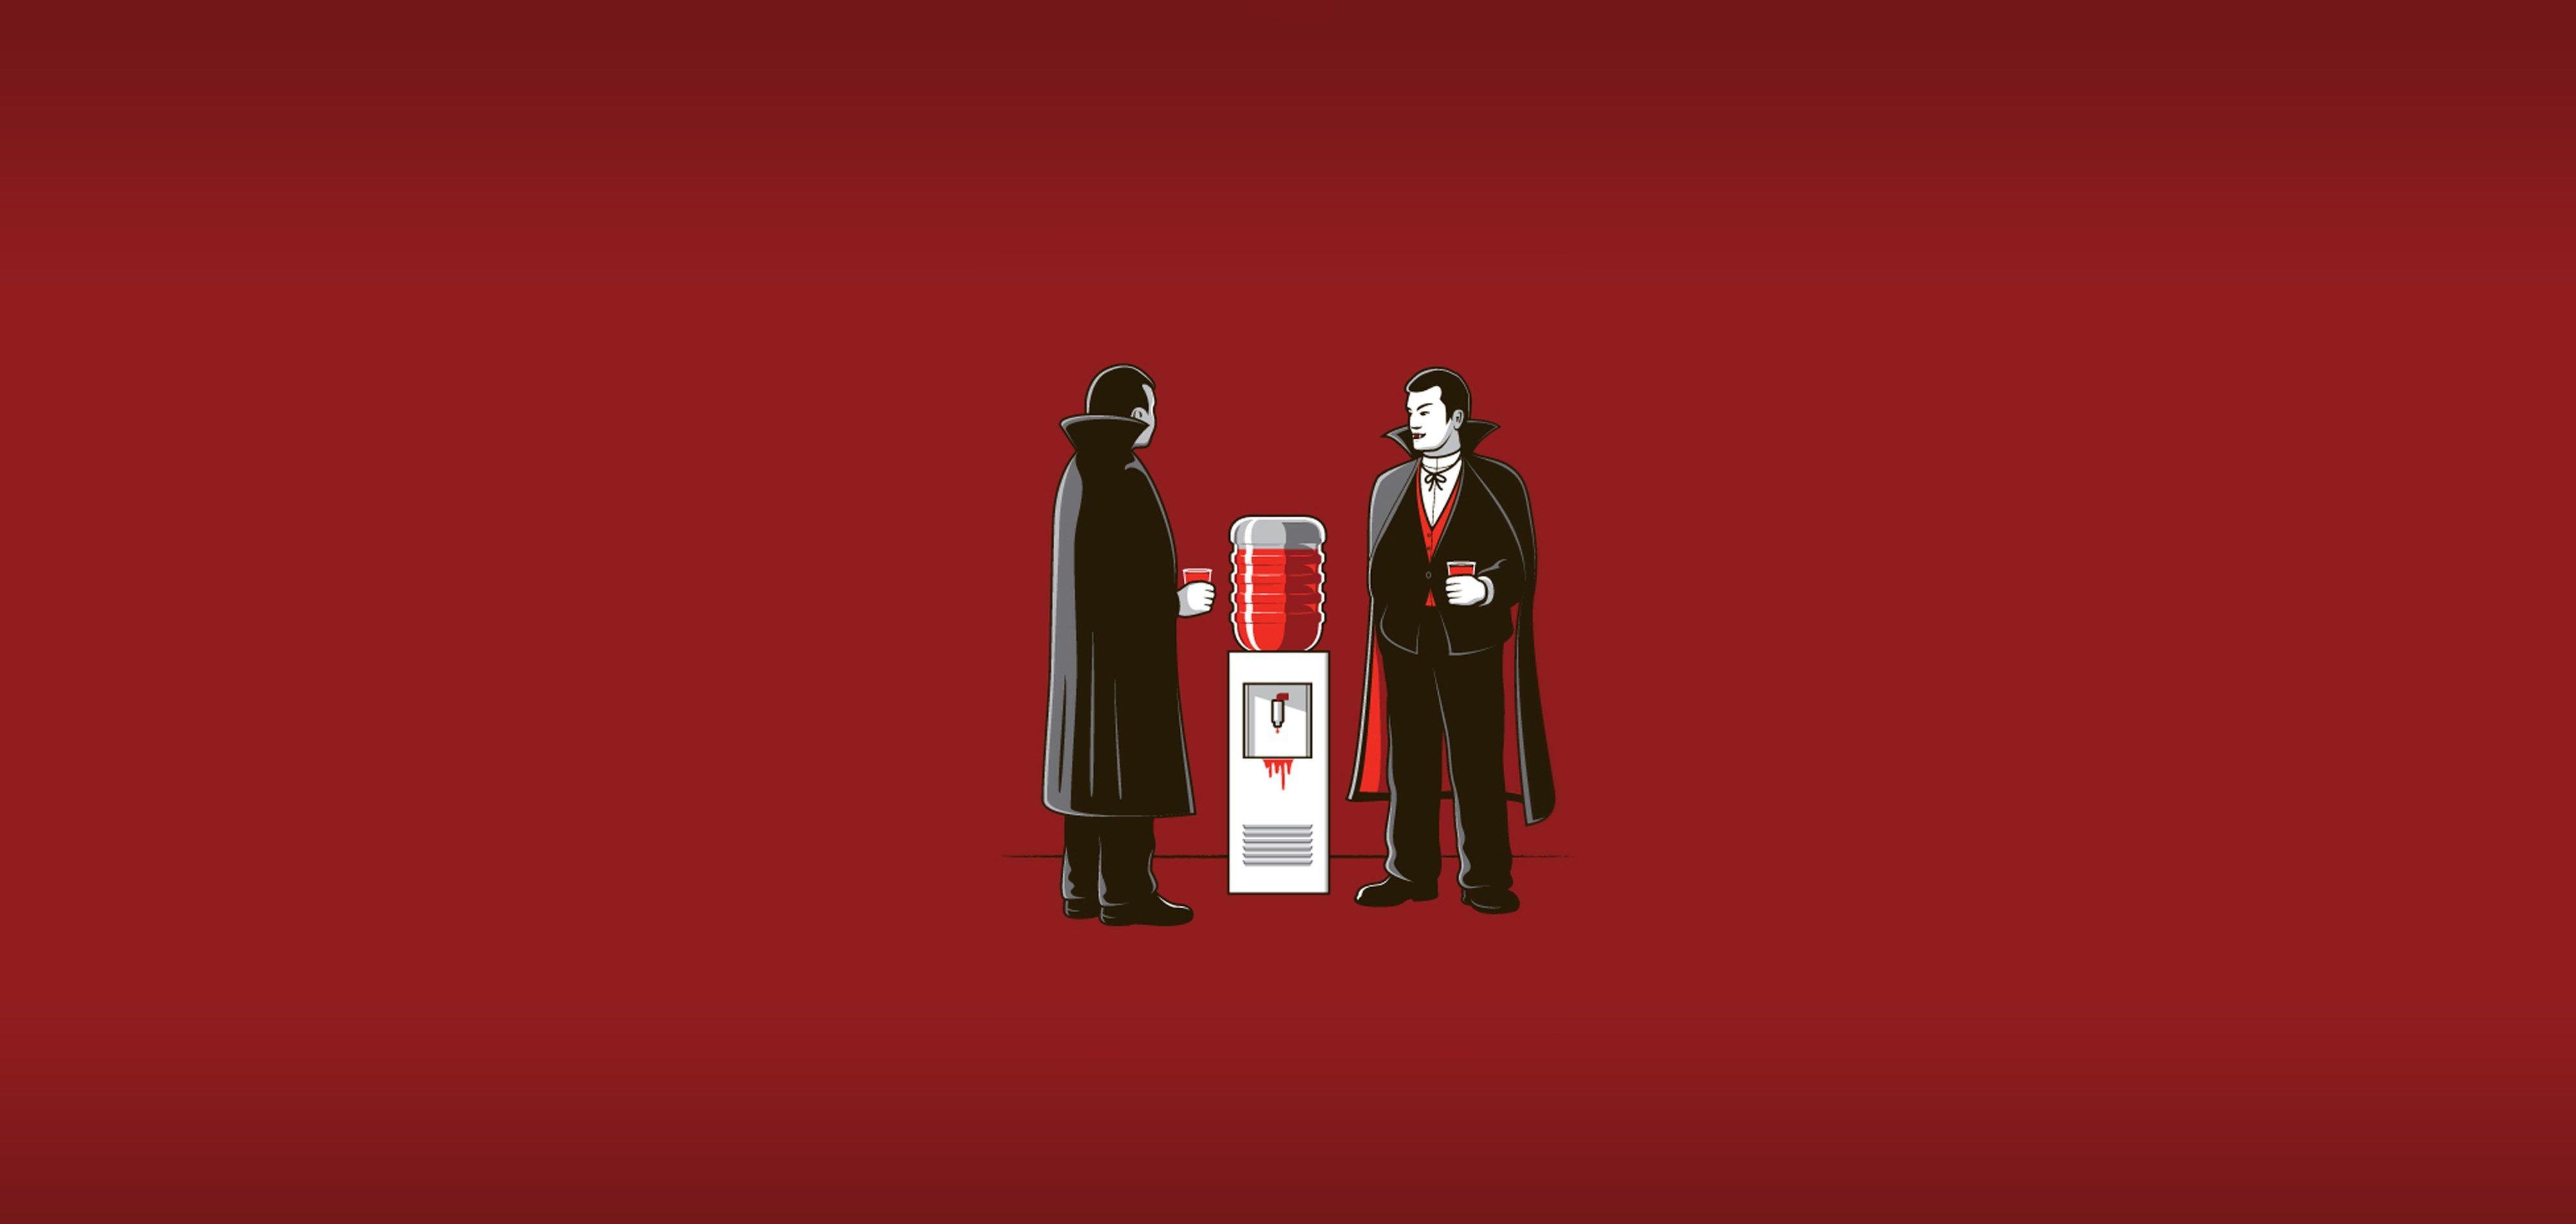 Dracula 4k Wallpaper 4000x1900 Funny Iphone Wallpaper